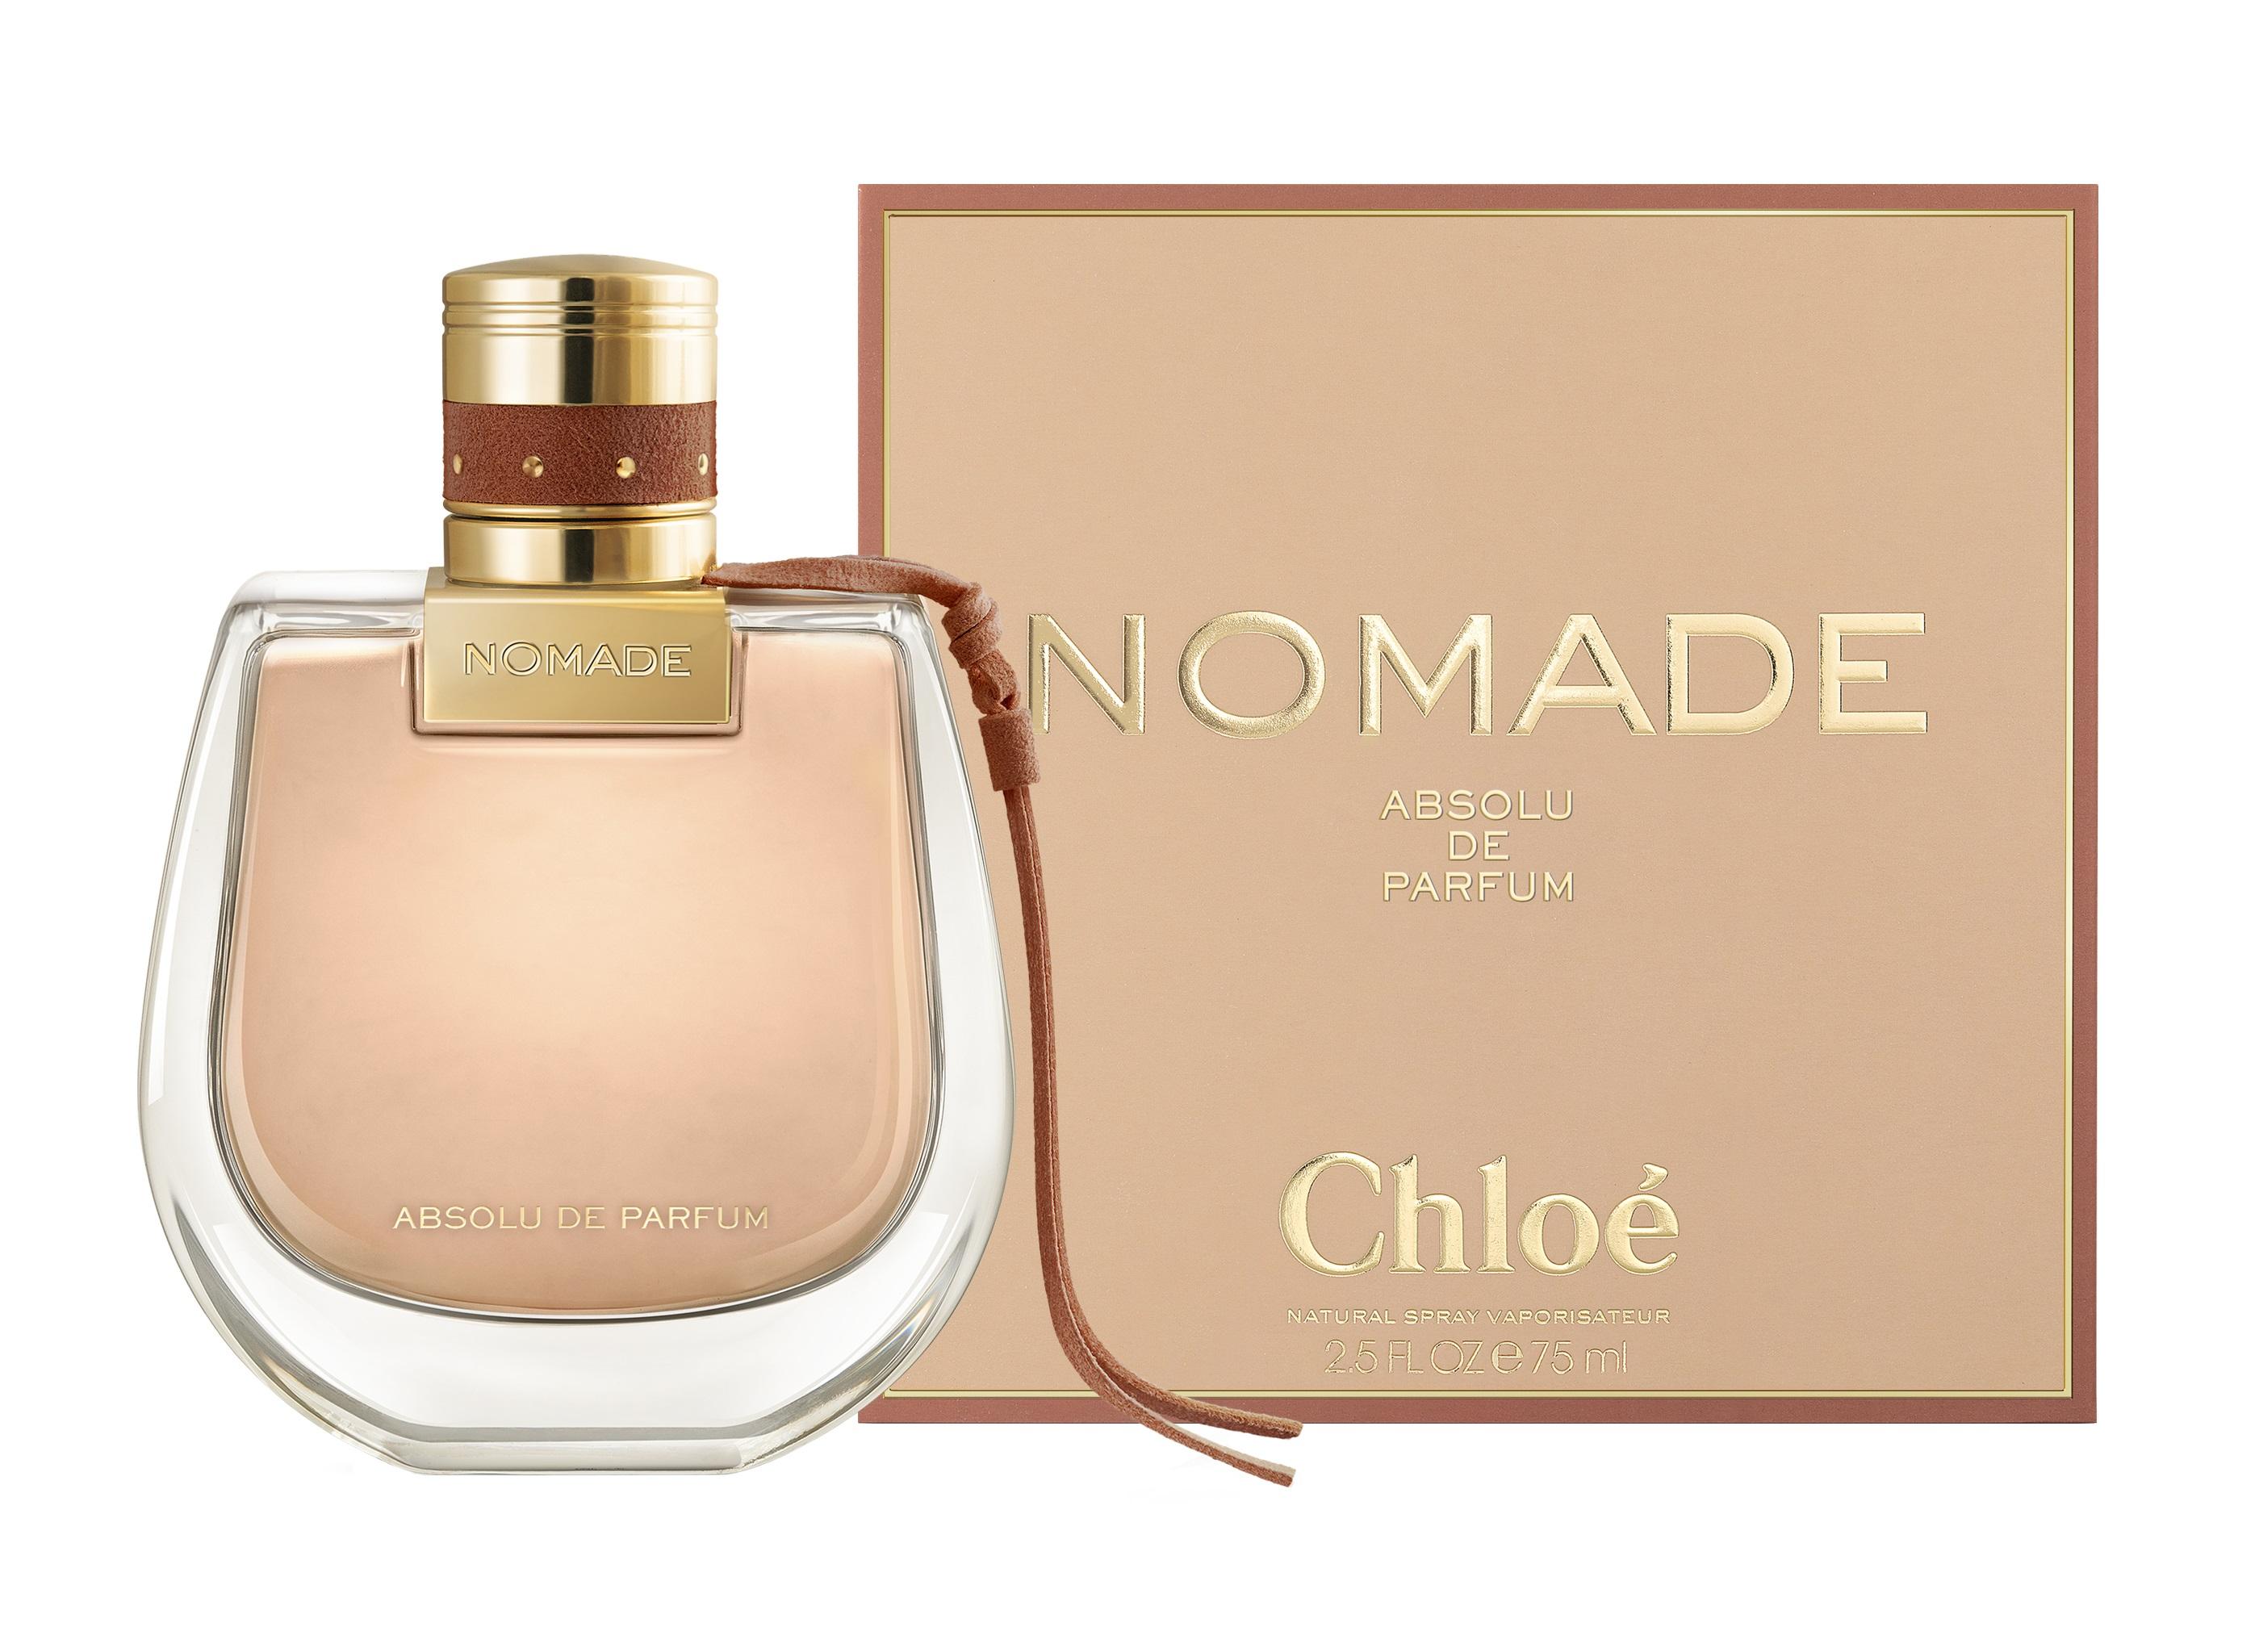 profumo chloe nomade 30 ml amazon.it